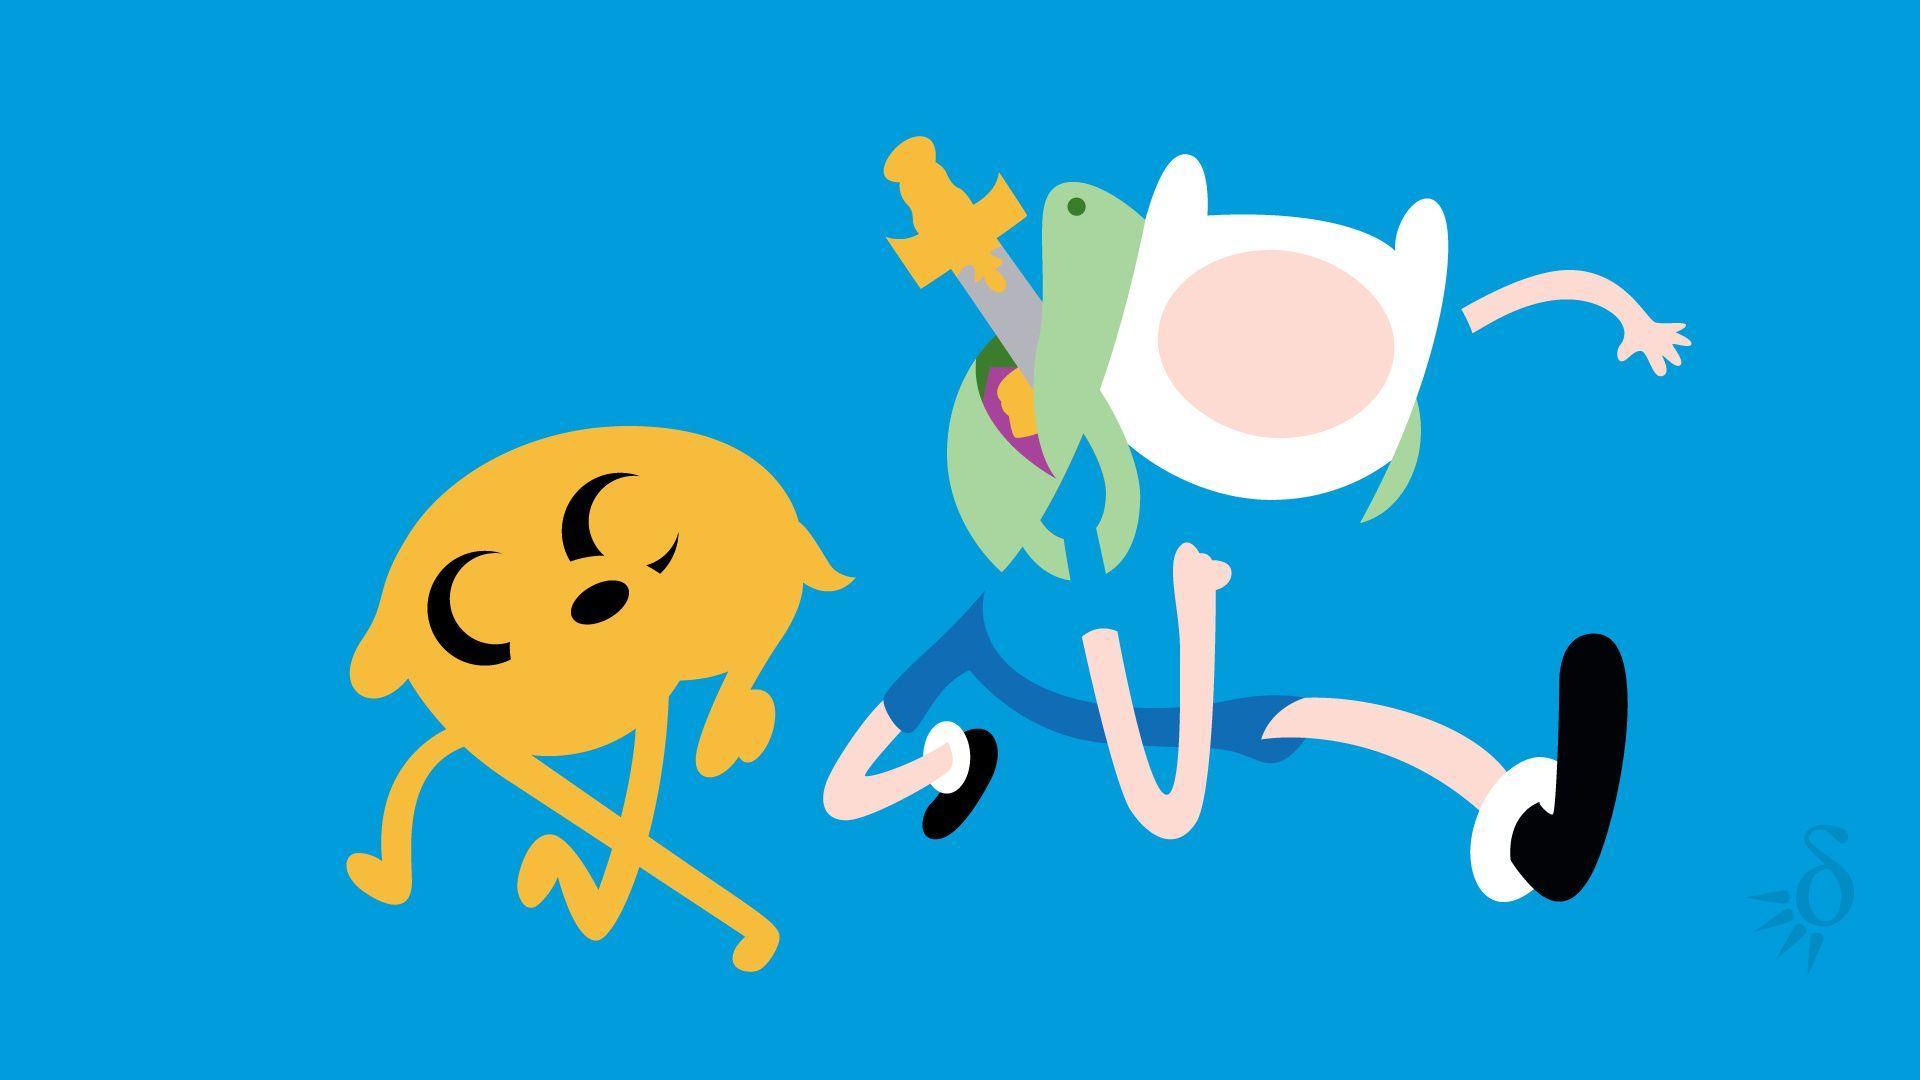 Adventure Time Wallpapers Hd Finn Wallpaper Cave